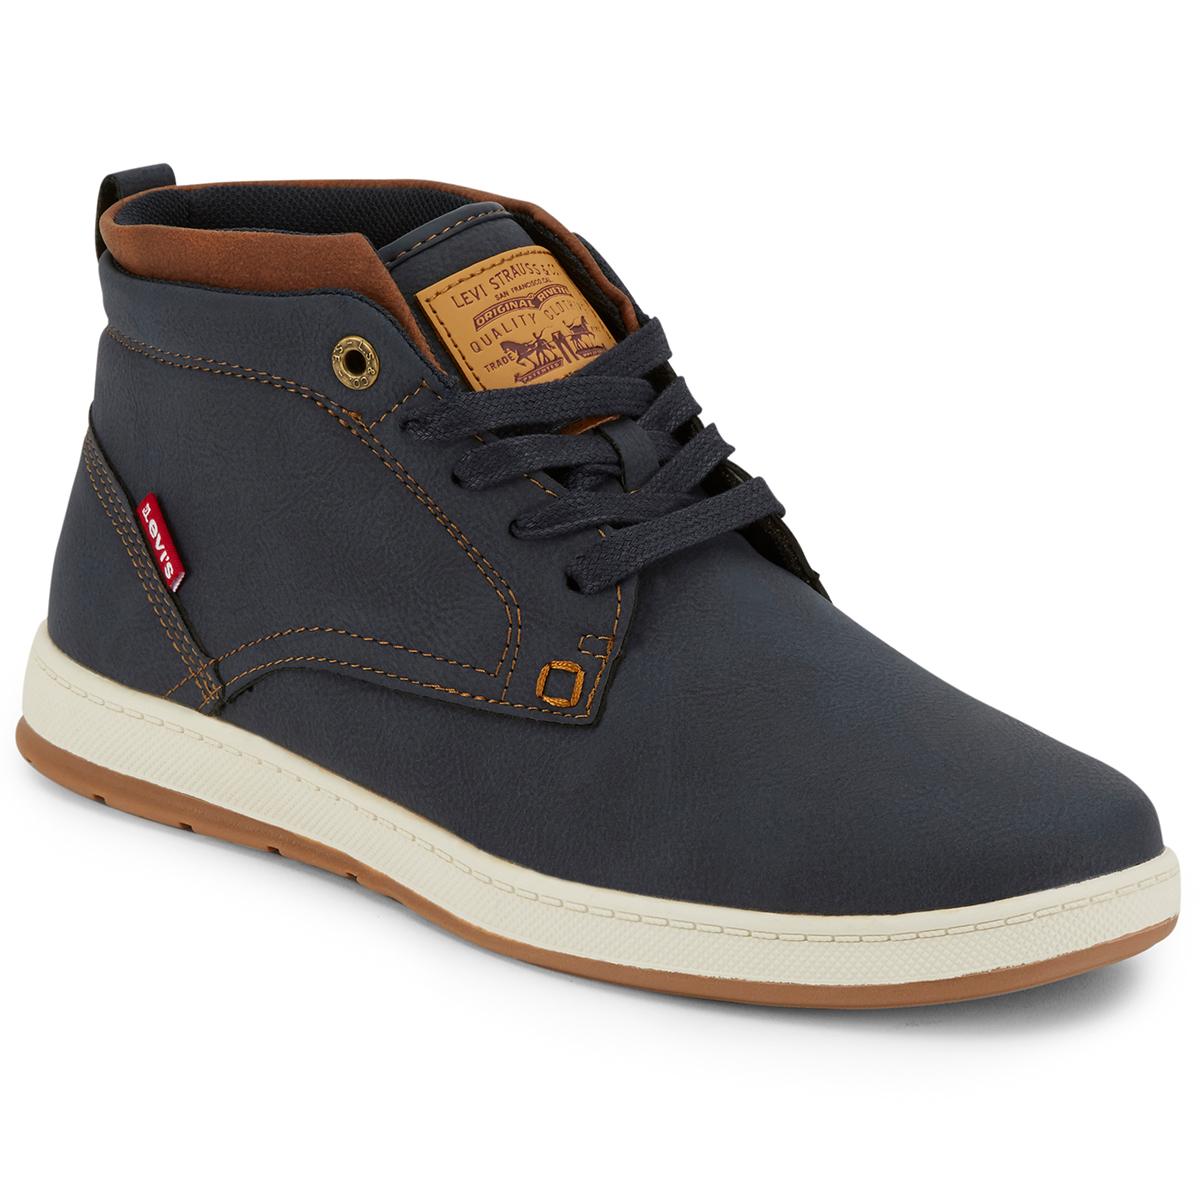 Levi's Men's Goshen Waxed Ul Nb Shoes - Blue, 11